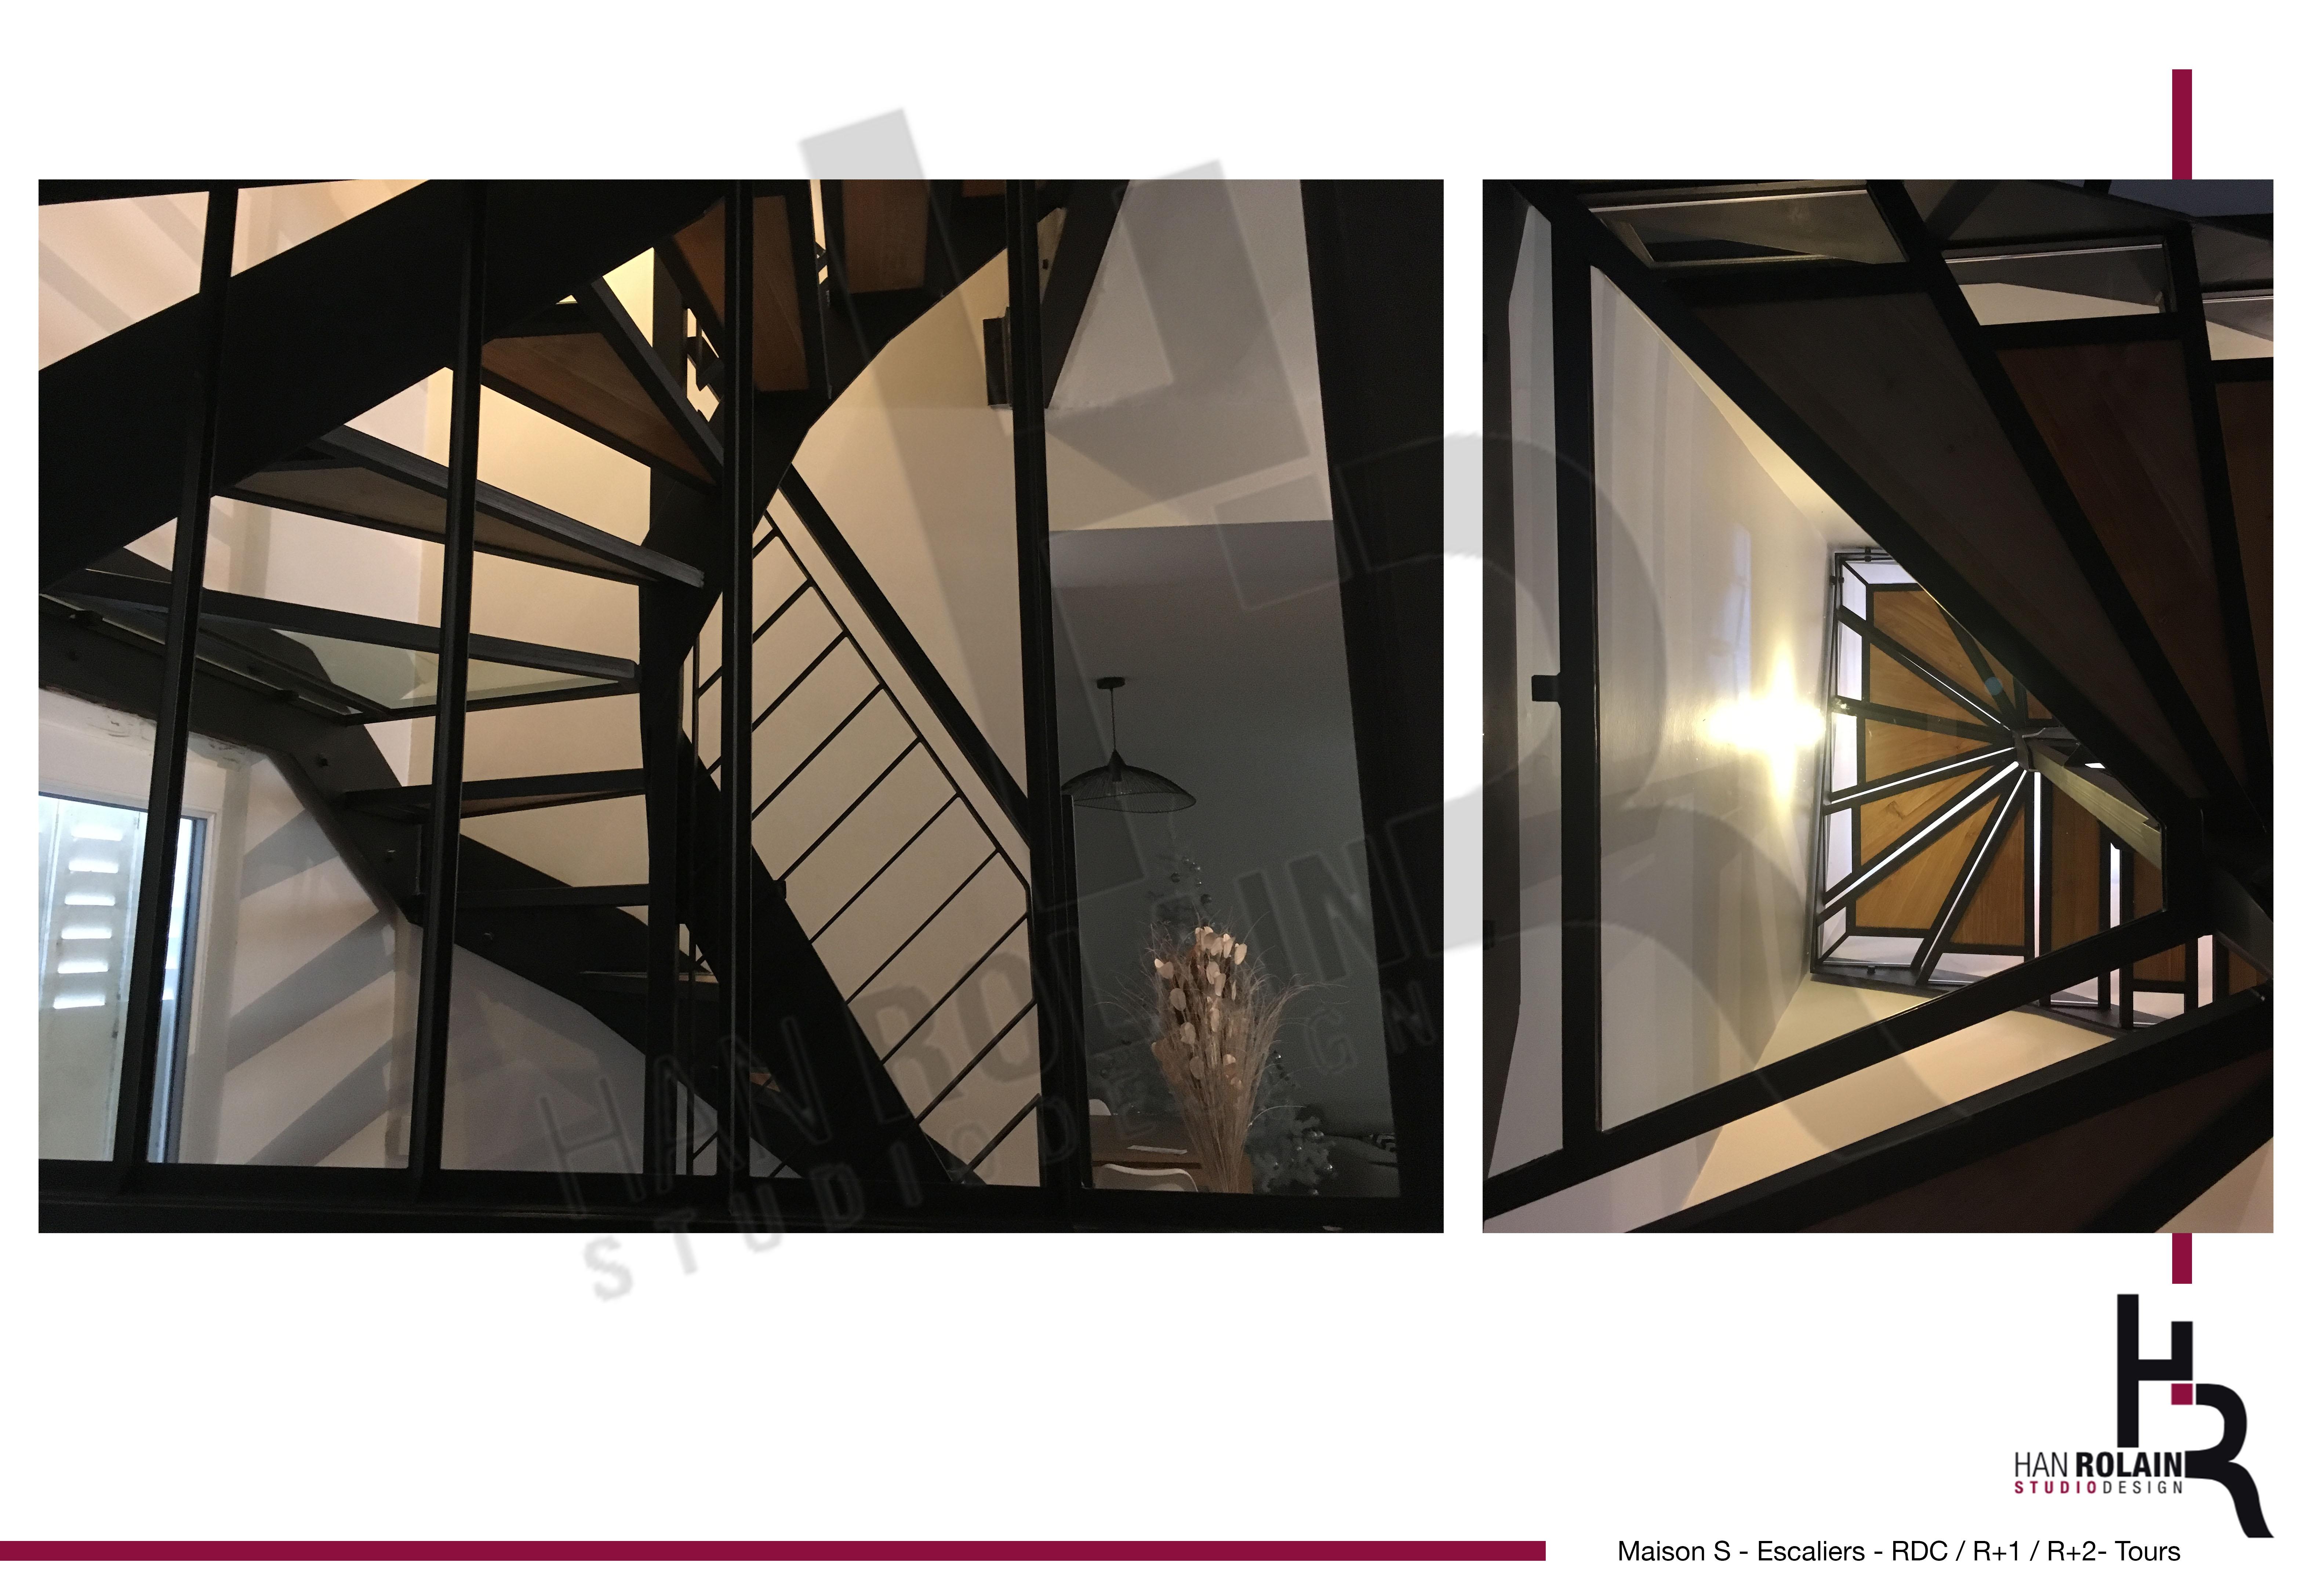 Escaliers S